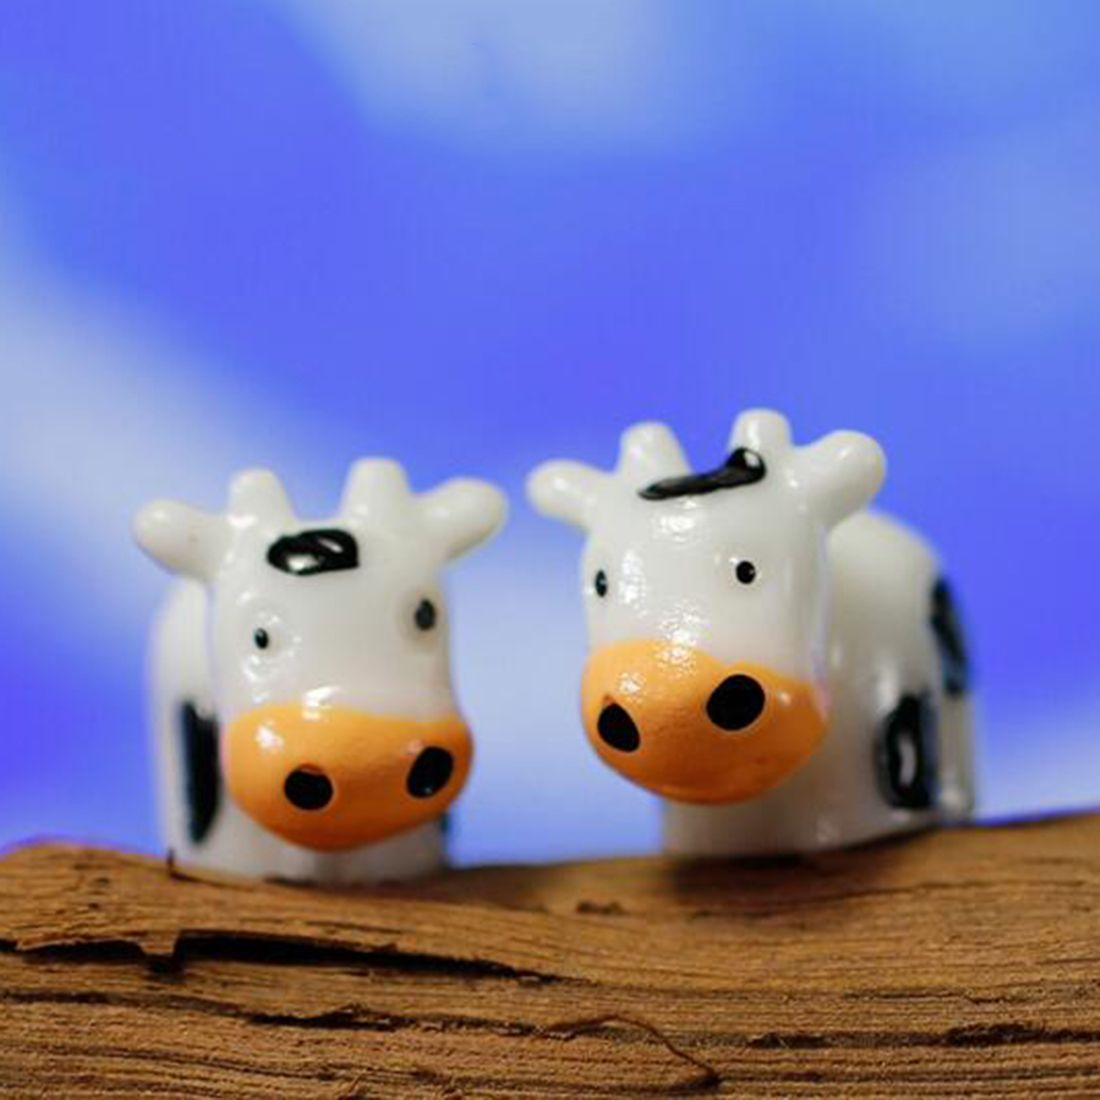 Cows Miniature Dollhouse Picture